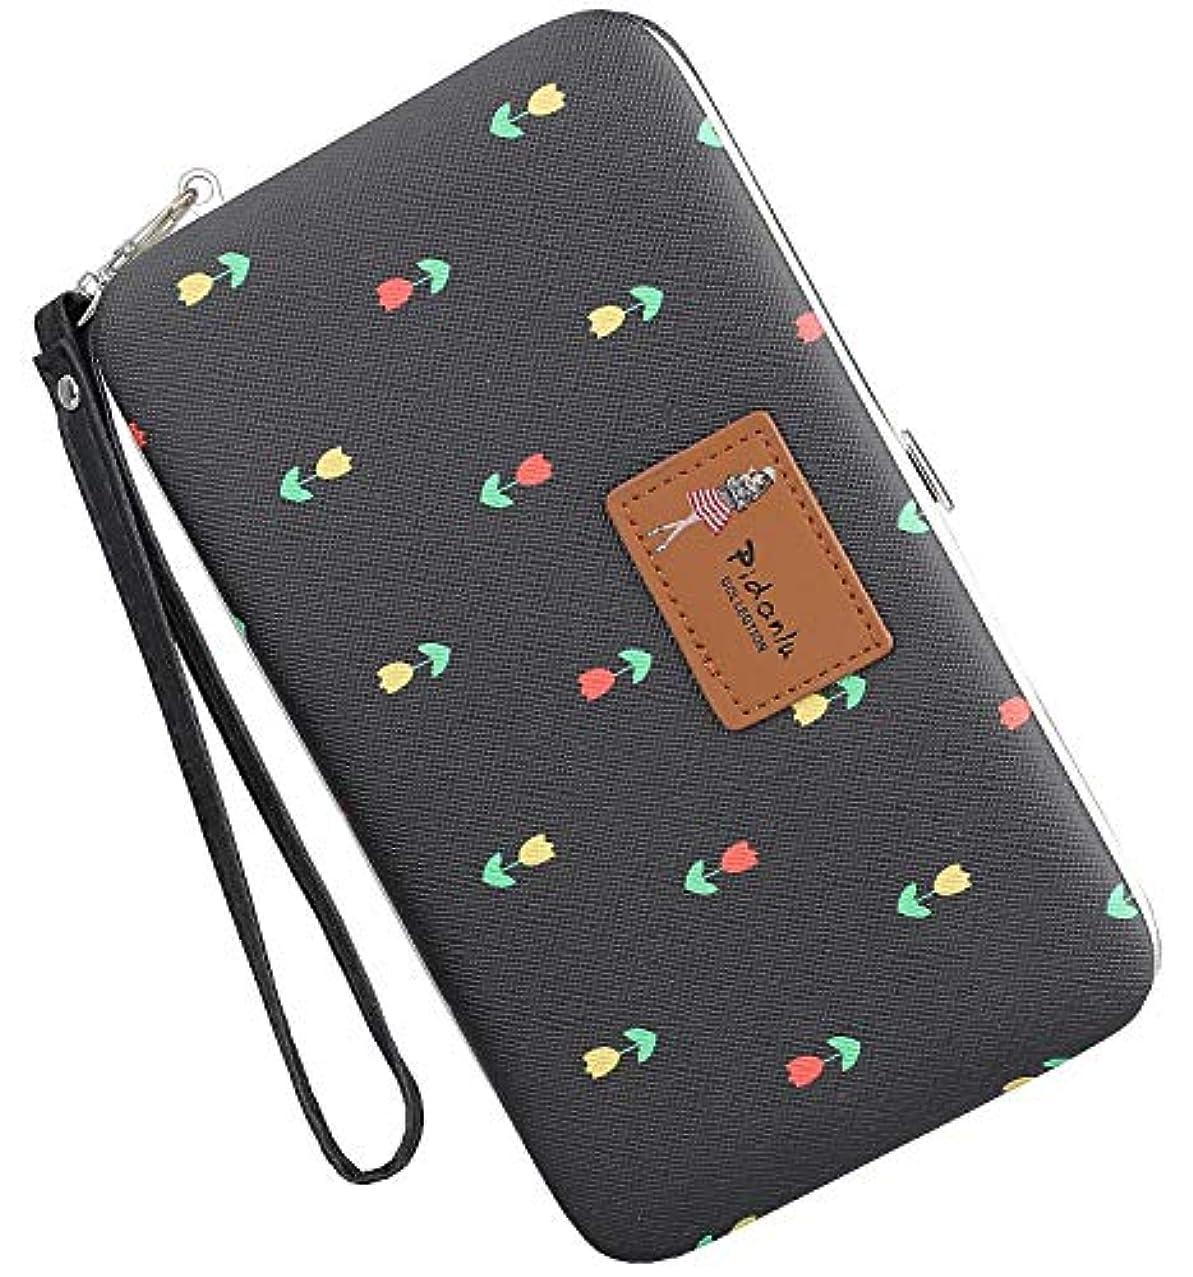 Leather Phone Clutch Wallet Snap Wallet for Ladies Wristlet Hard Case Long Purse for iPhone X / 8/8 Plus / 7/7 Plus Floral